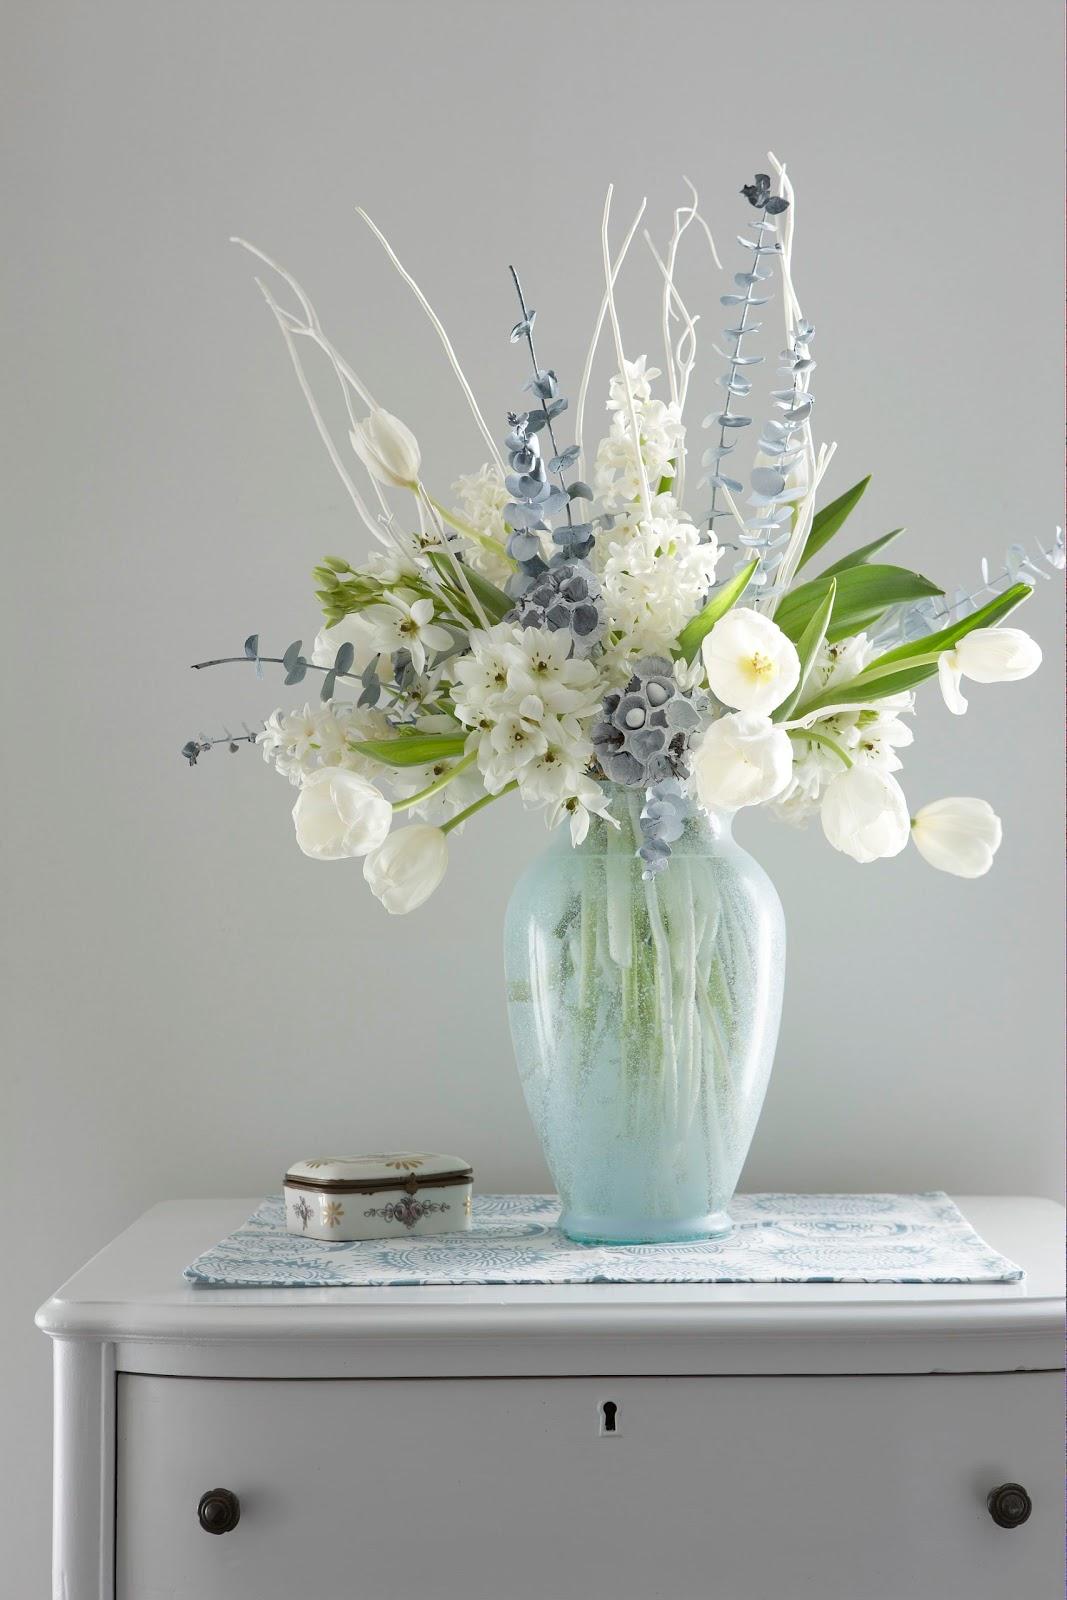 Karin lidbeck styling a winter white floral arrangement